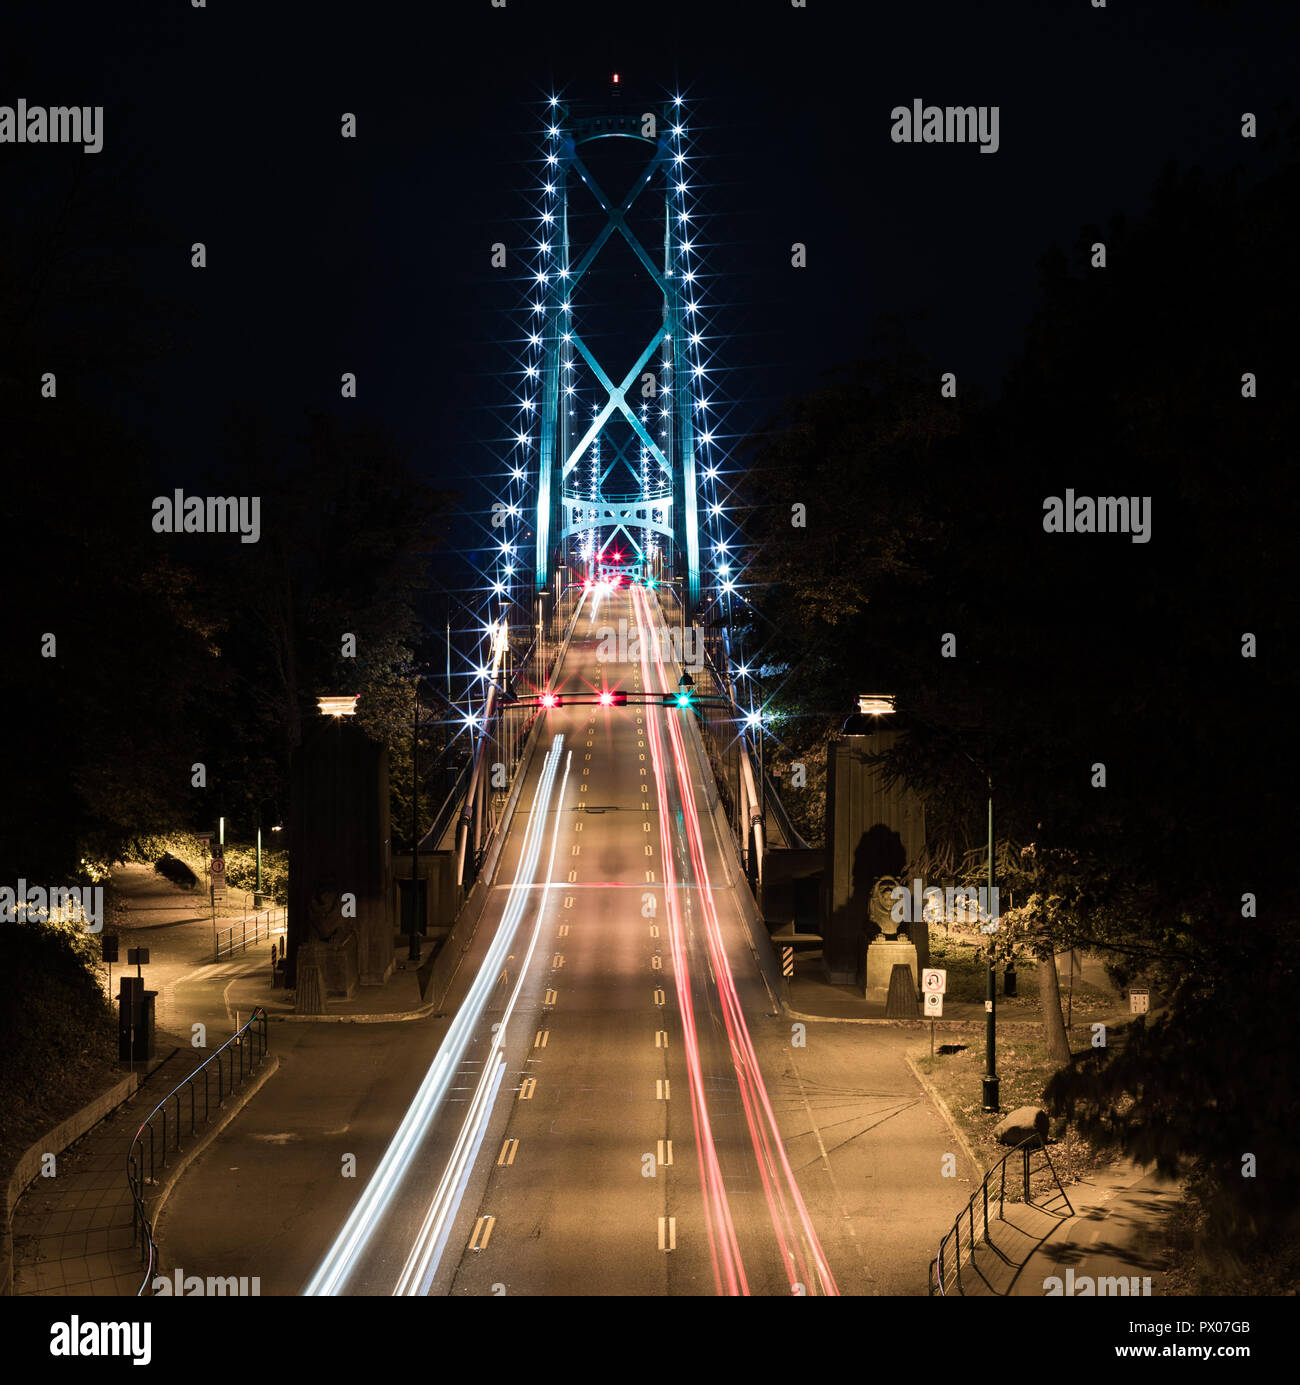 Suspension bridge with light trail - Stock Image